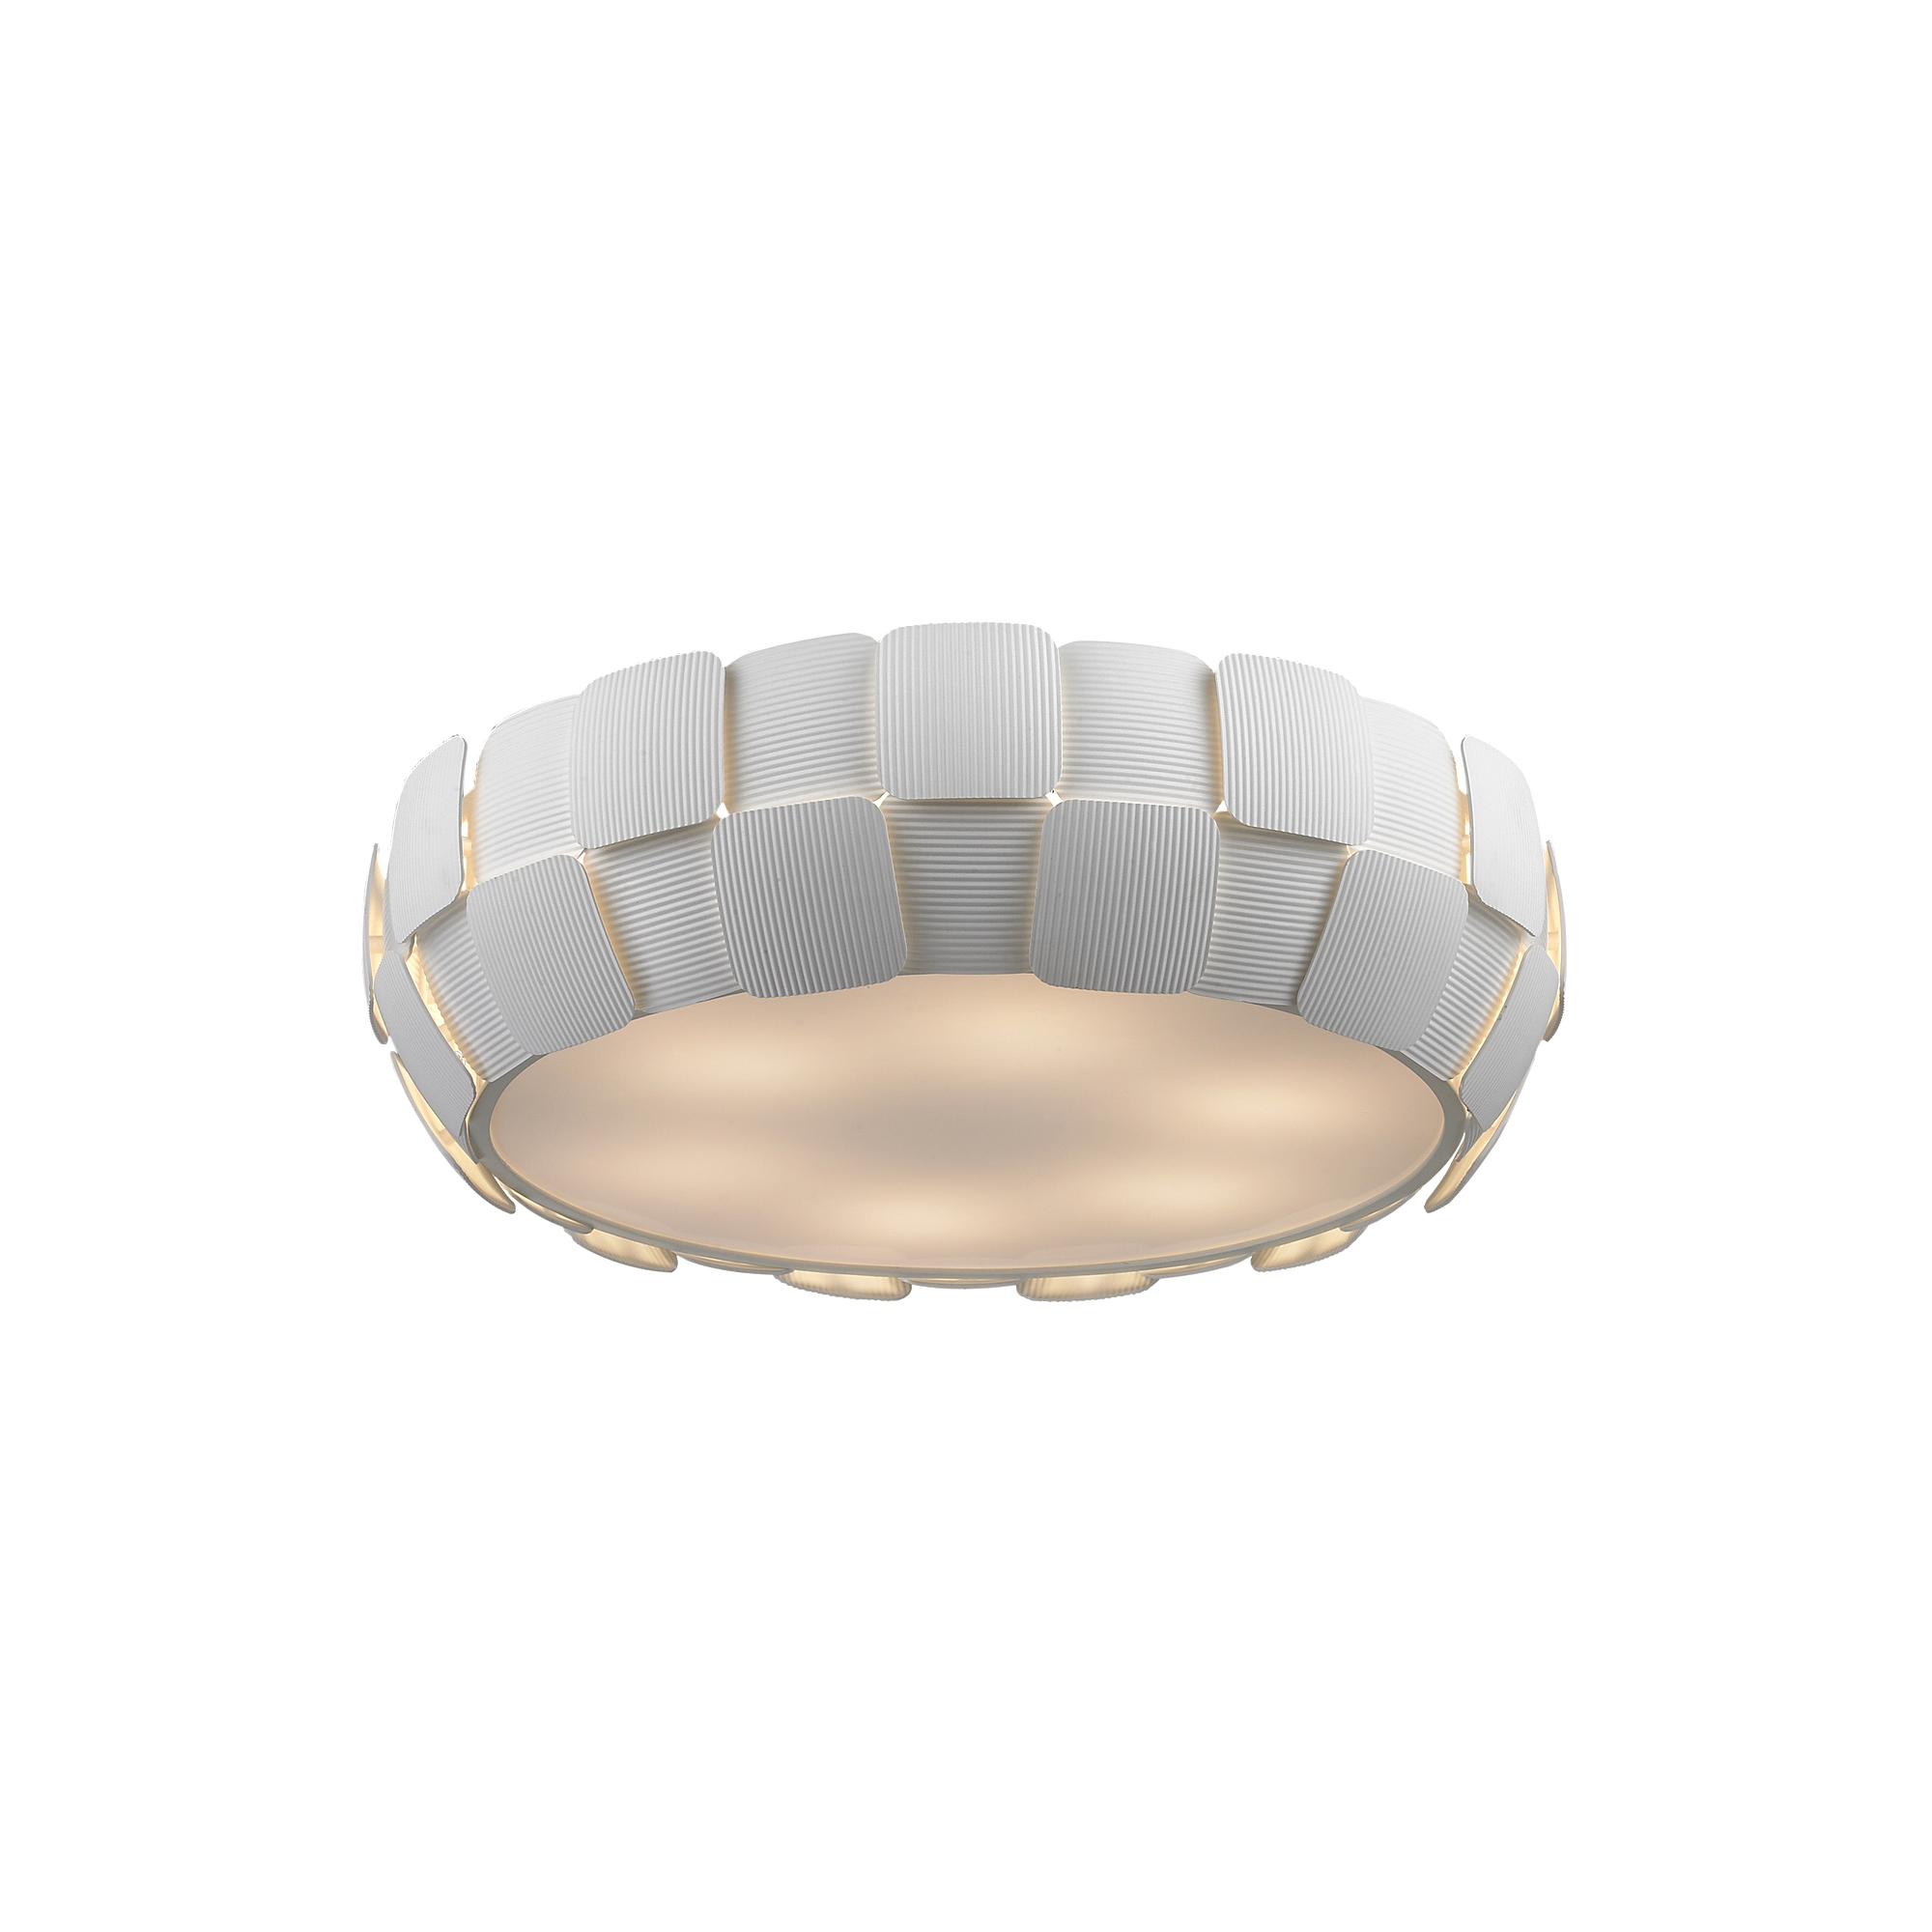 c031706cs8a1 sole lampa sufitowa oświetlenie salon